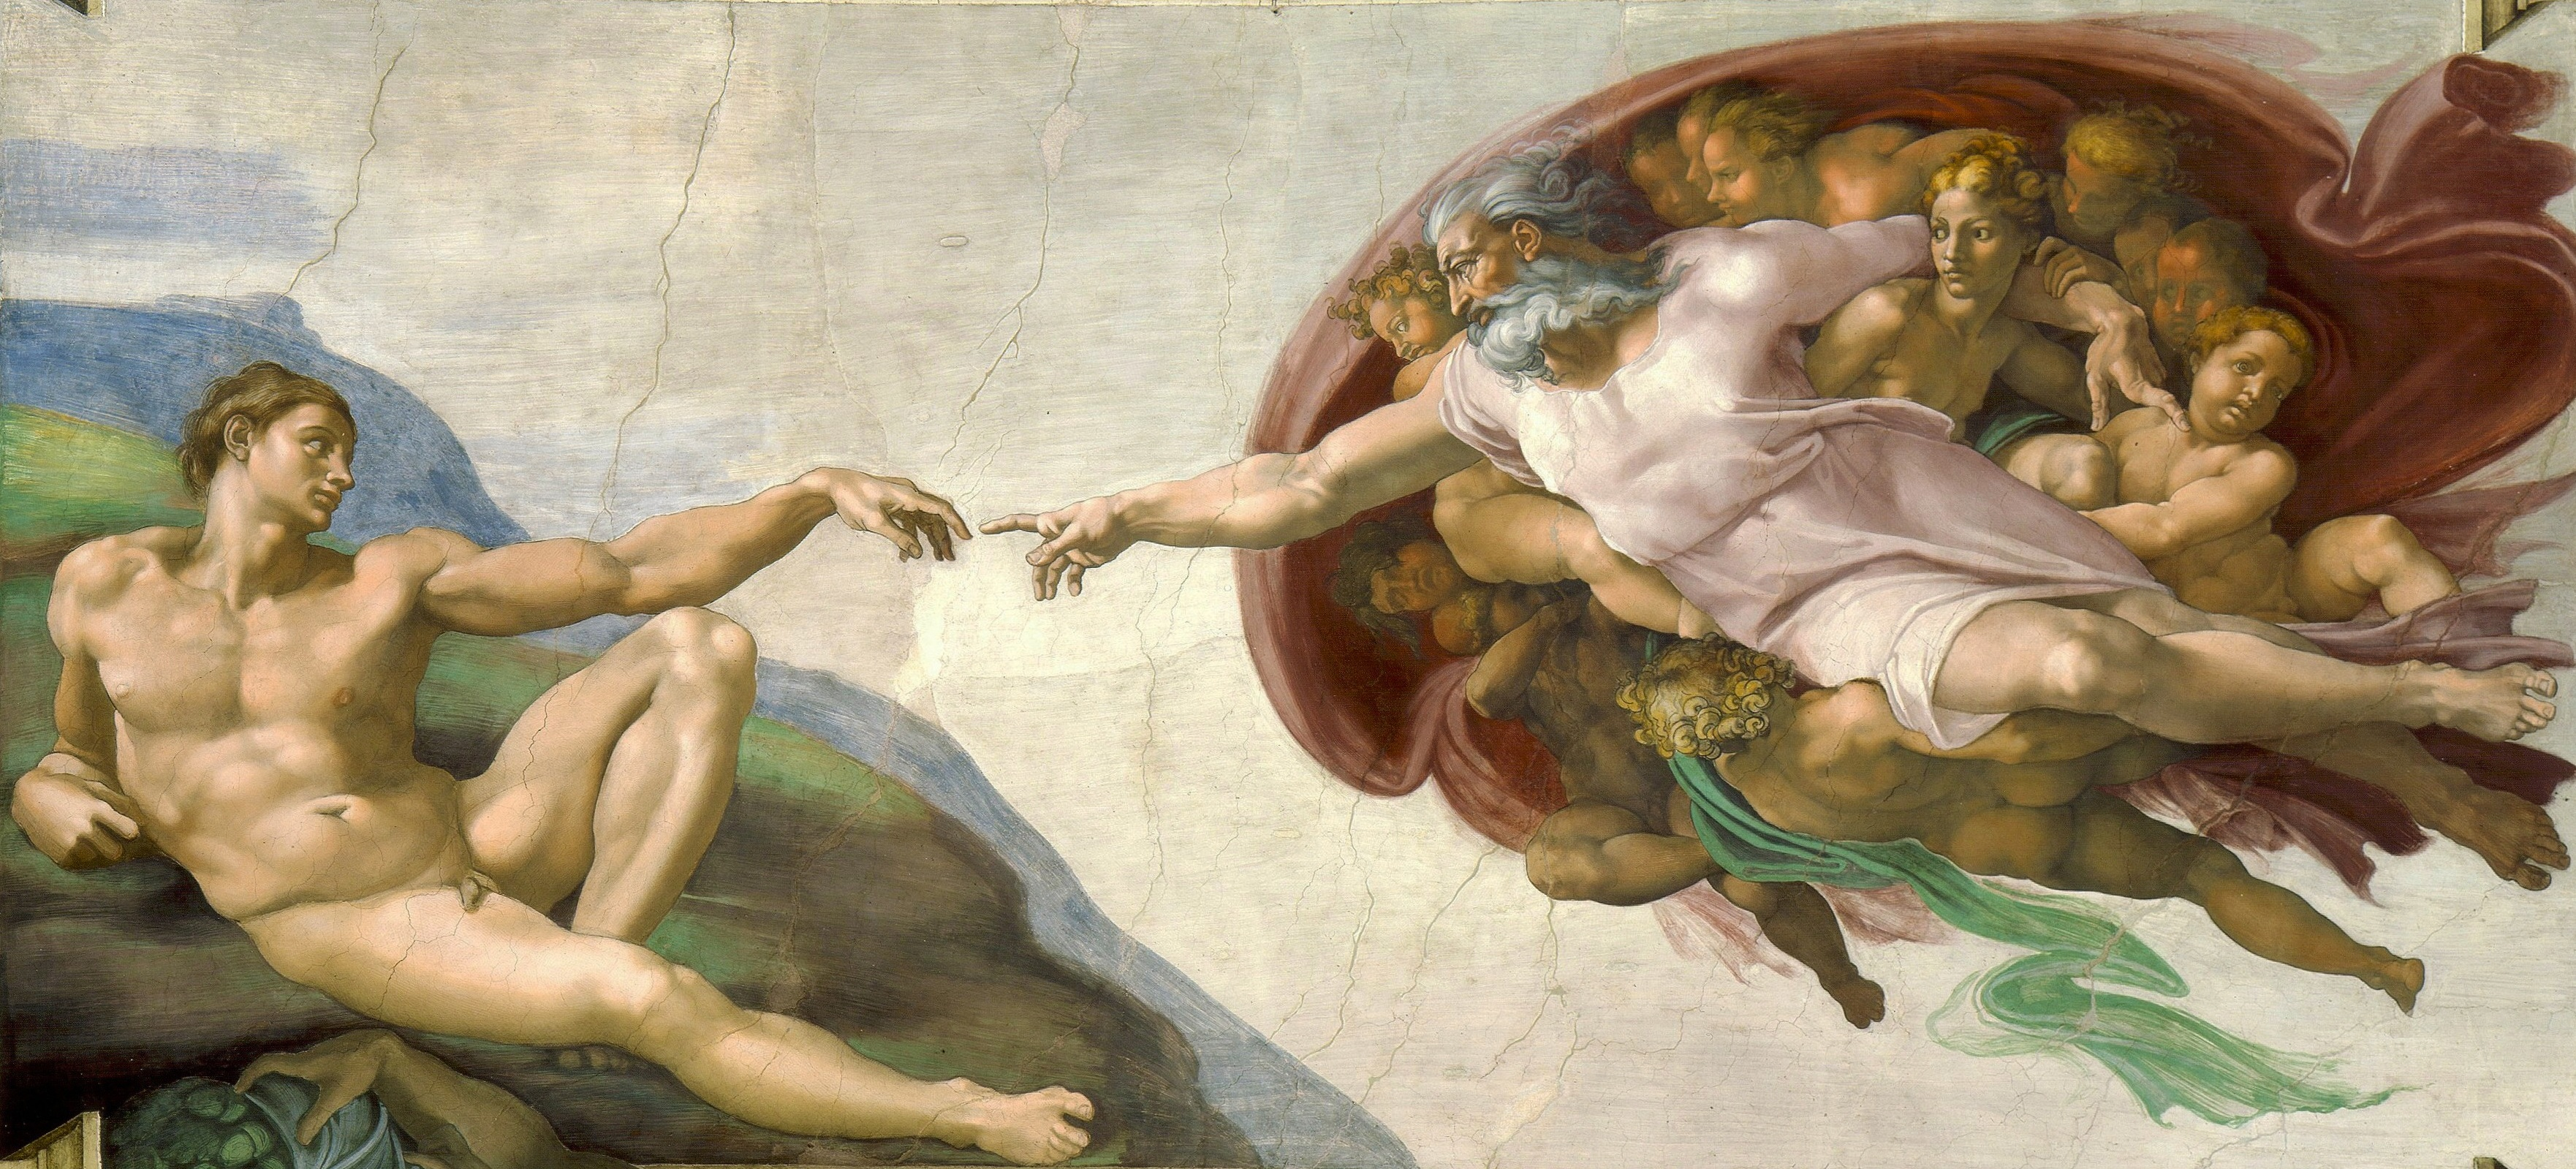 Michelangelo - Creation of Adam.jpg